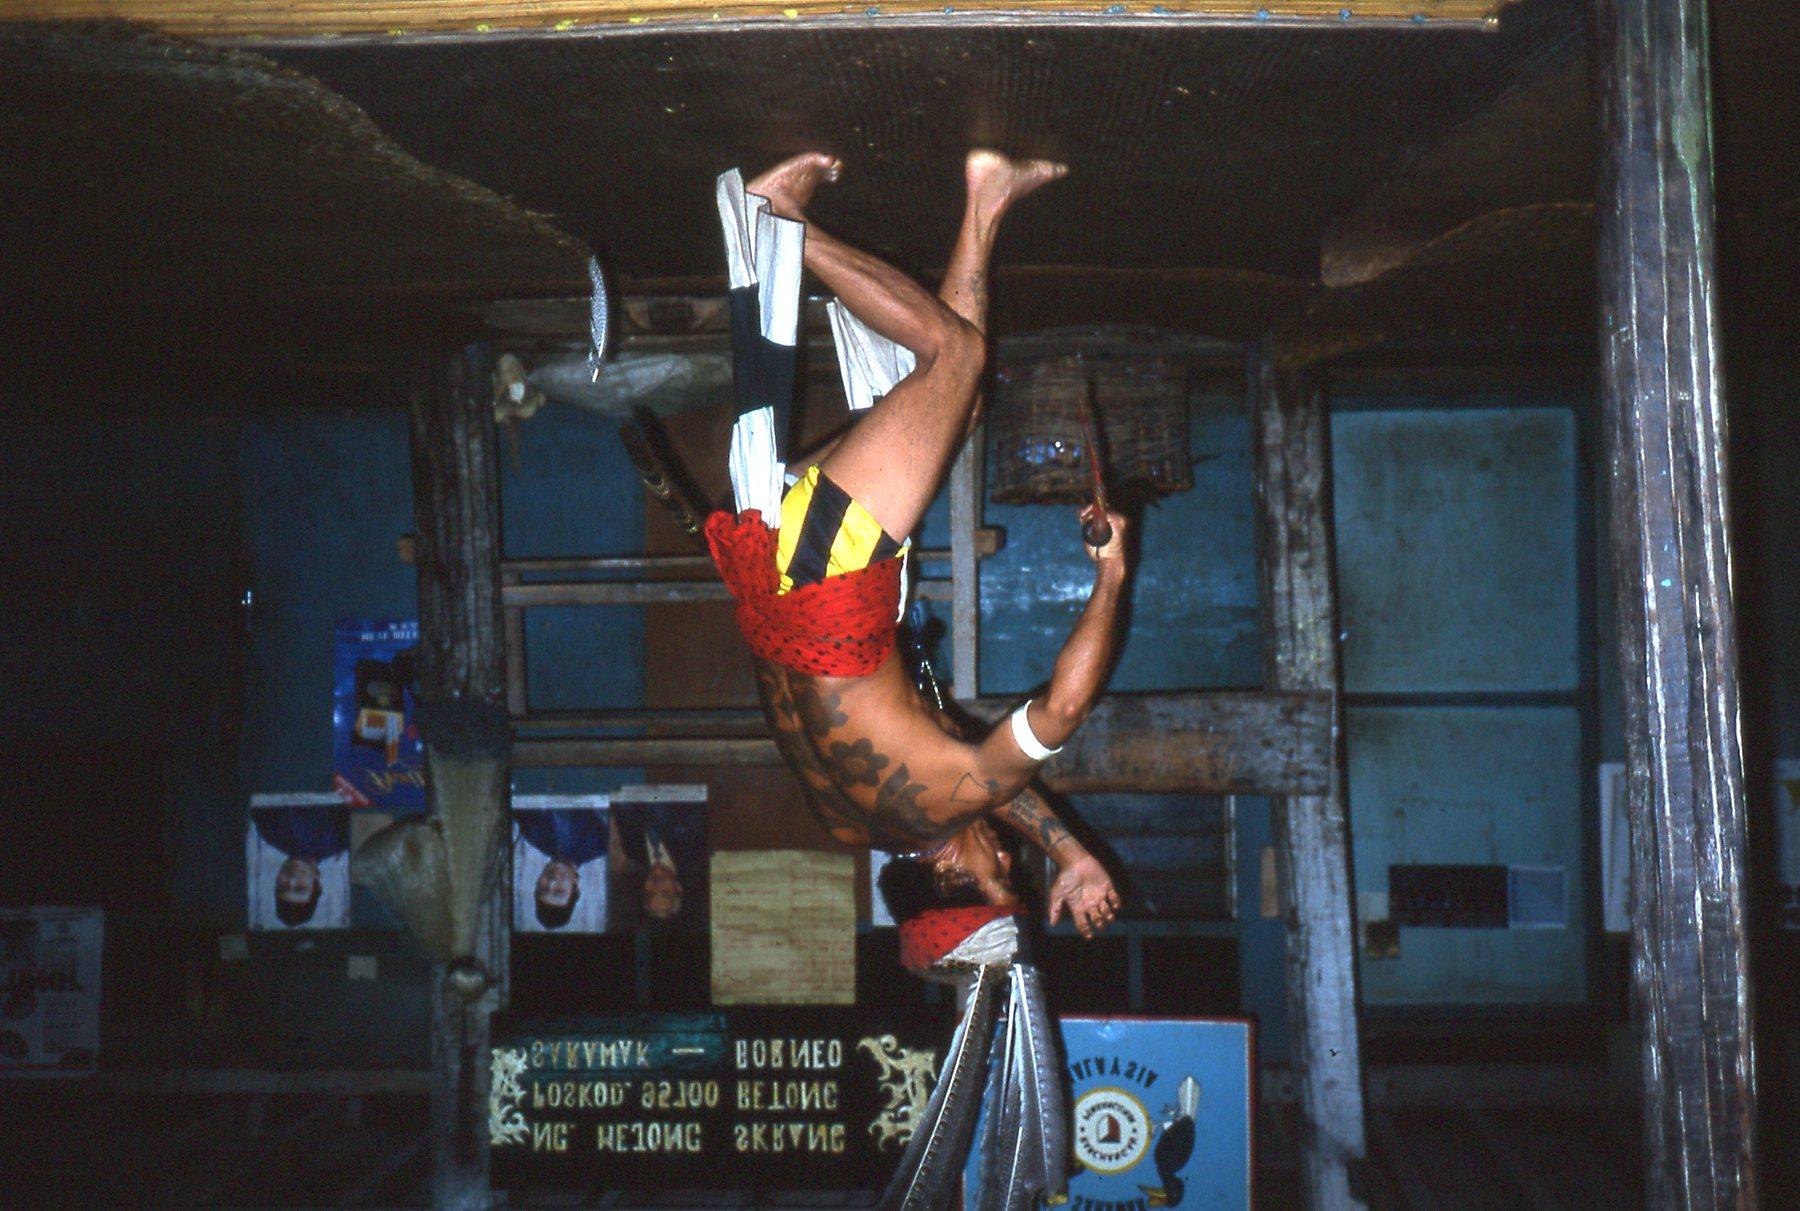 Tradtional Borneo dance